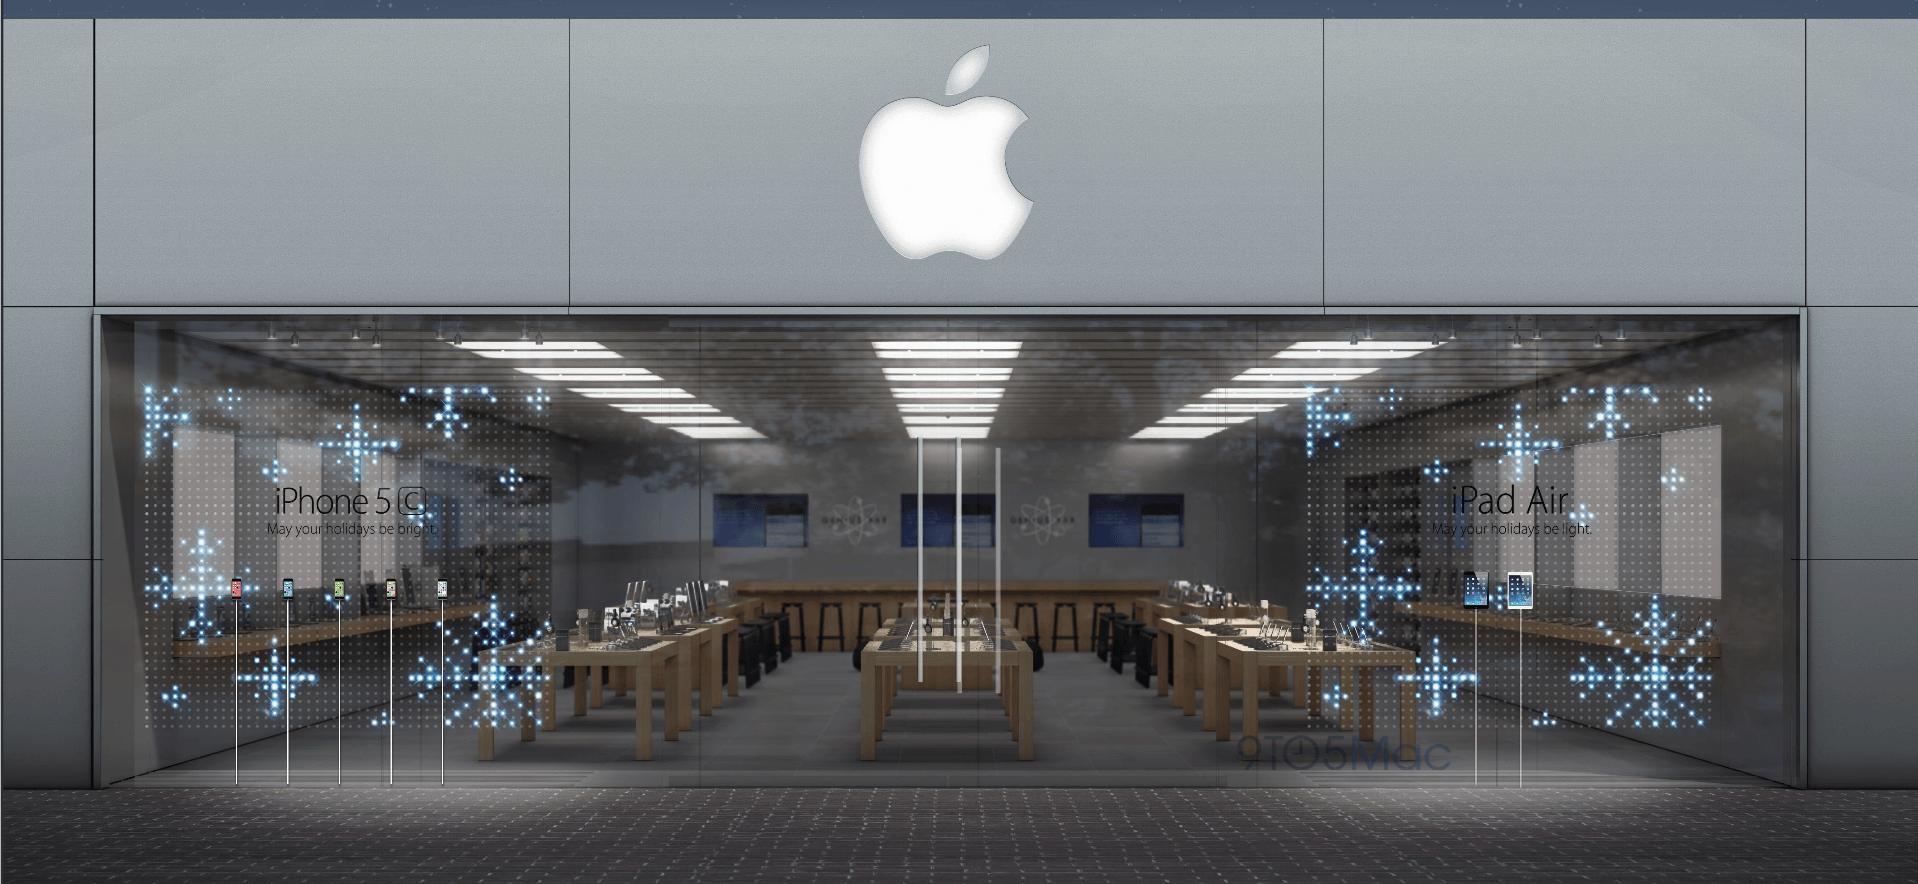 Apple Store Window Display Applestorearchitectureretail Pinned By Www Modlar Com Fenster Auslagen Shop Fassade